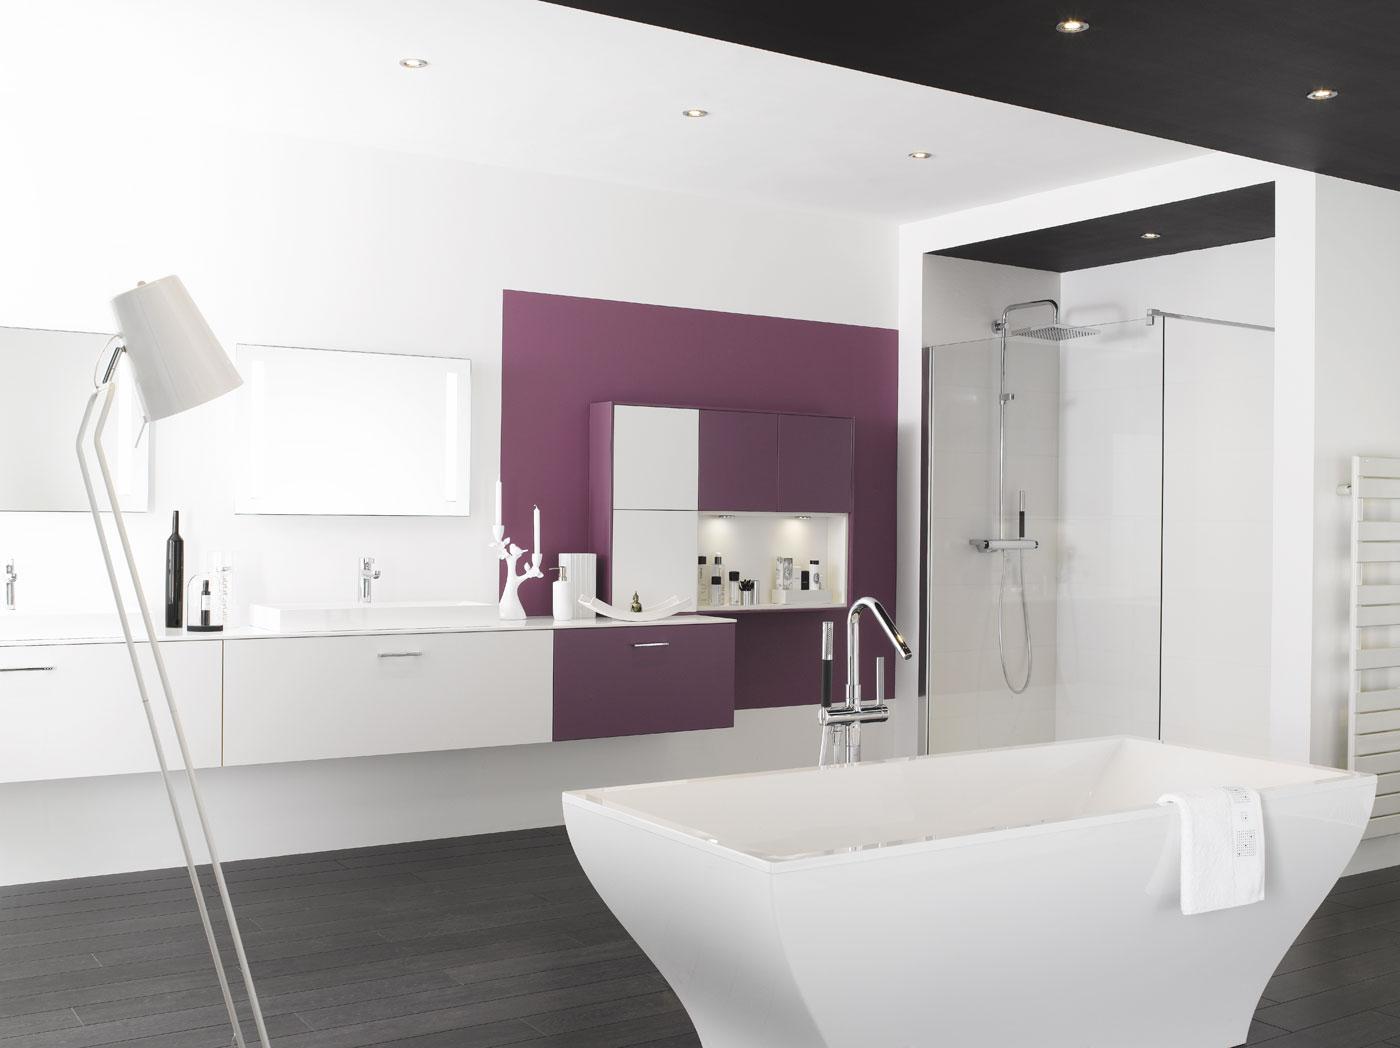 Modele Salle De Bain Perene ~ salle de bain perene architecture de la maison rendernova com